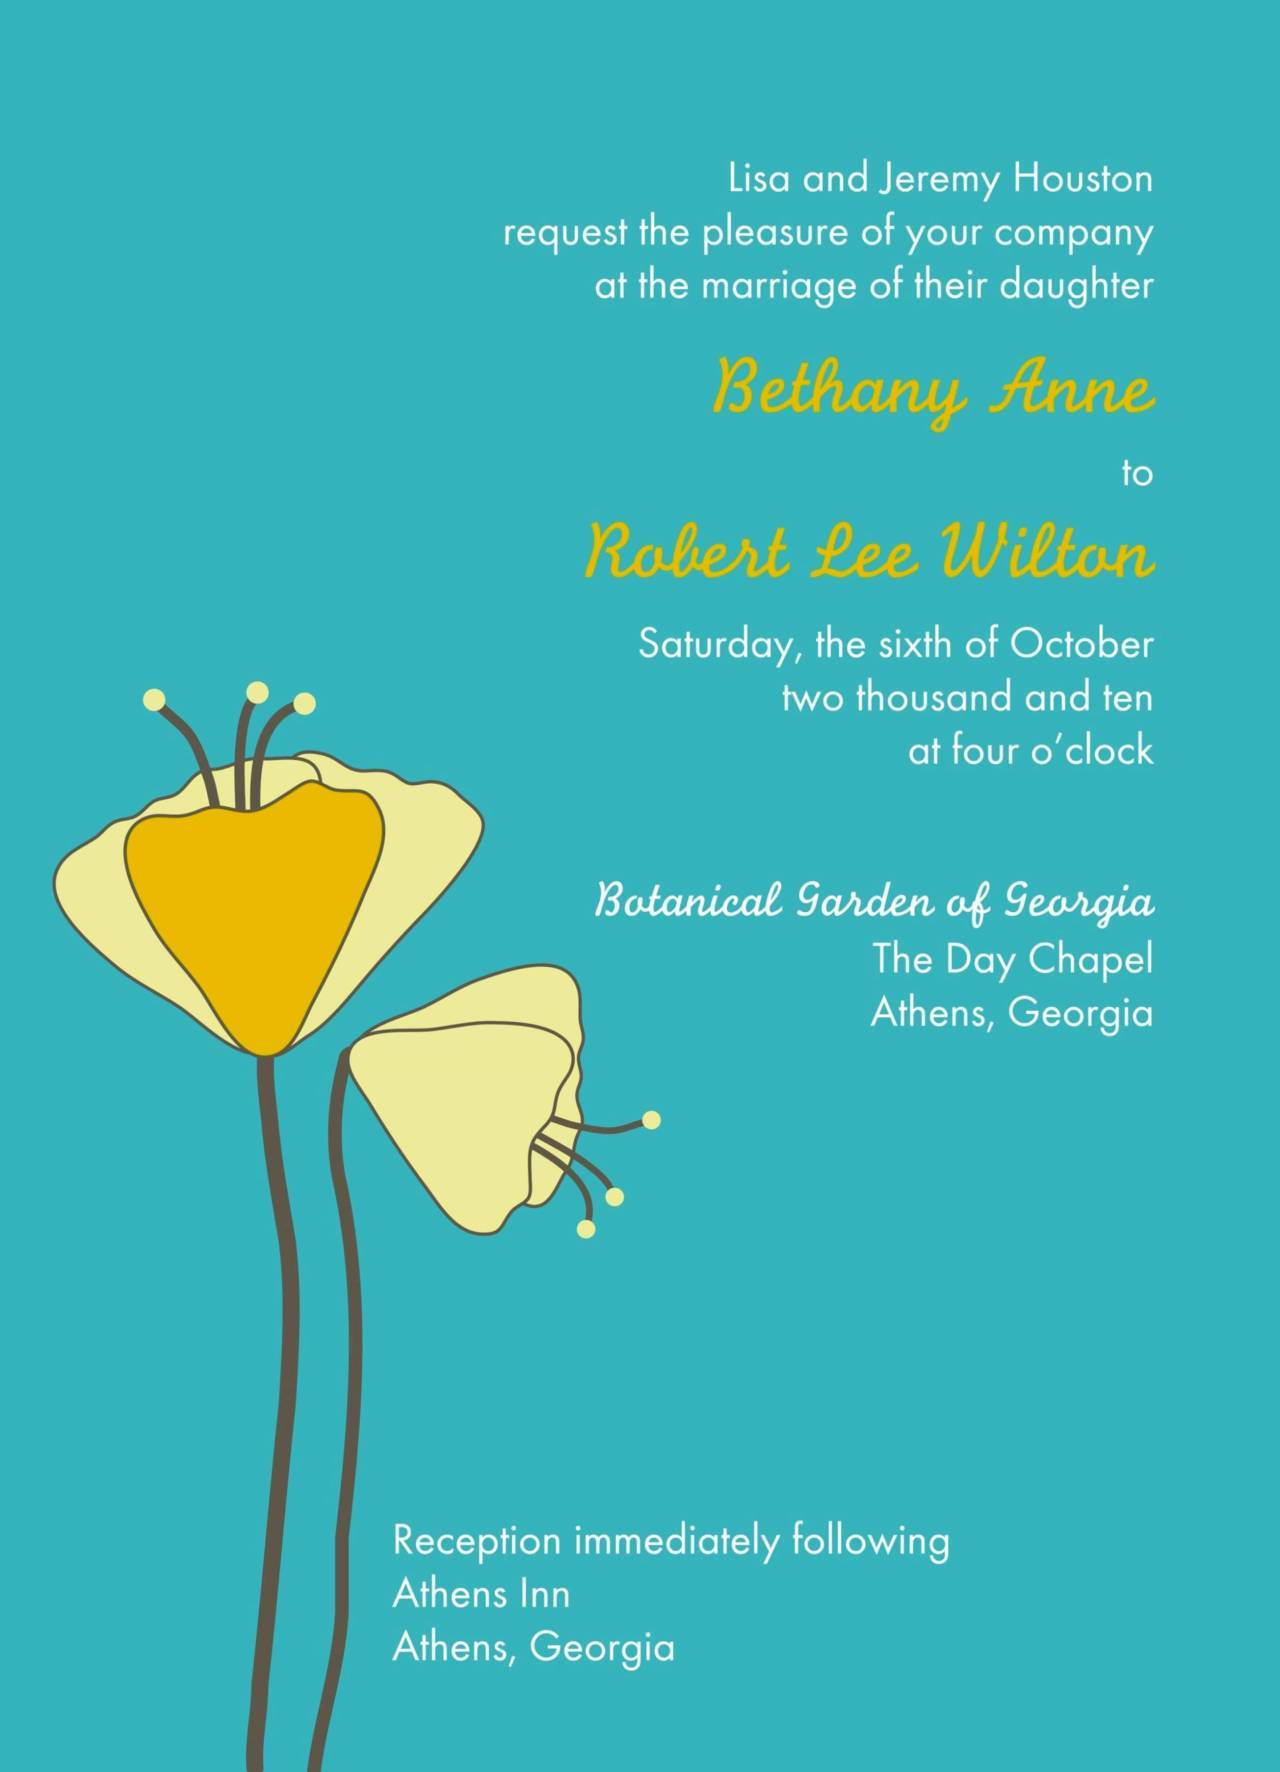 Book Launch Invitation Template SampleTemplatess SampleTemplatess